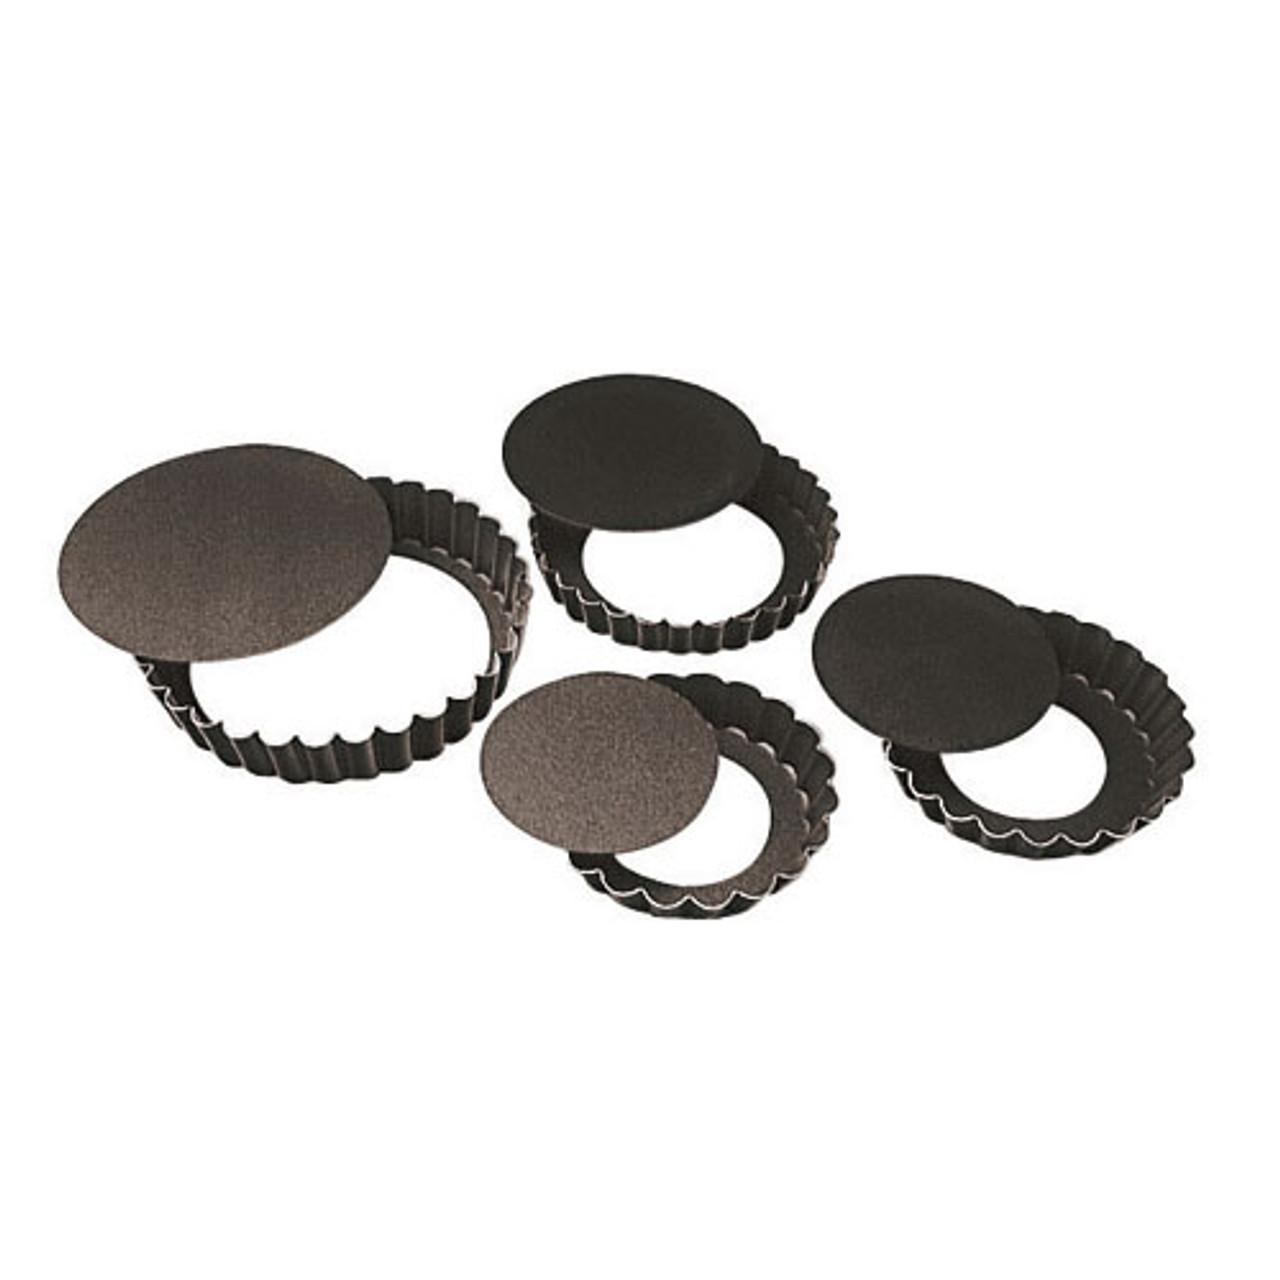 "Fluted N-Stick Tart Pan, Remo, DIA 4"" X H 3/4"""